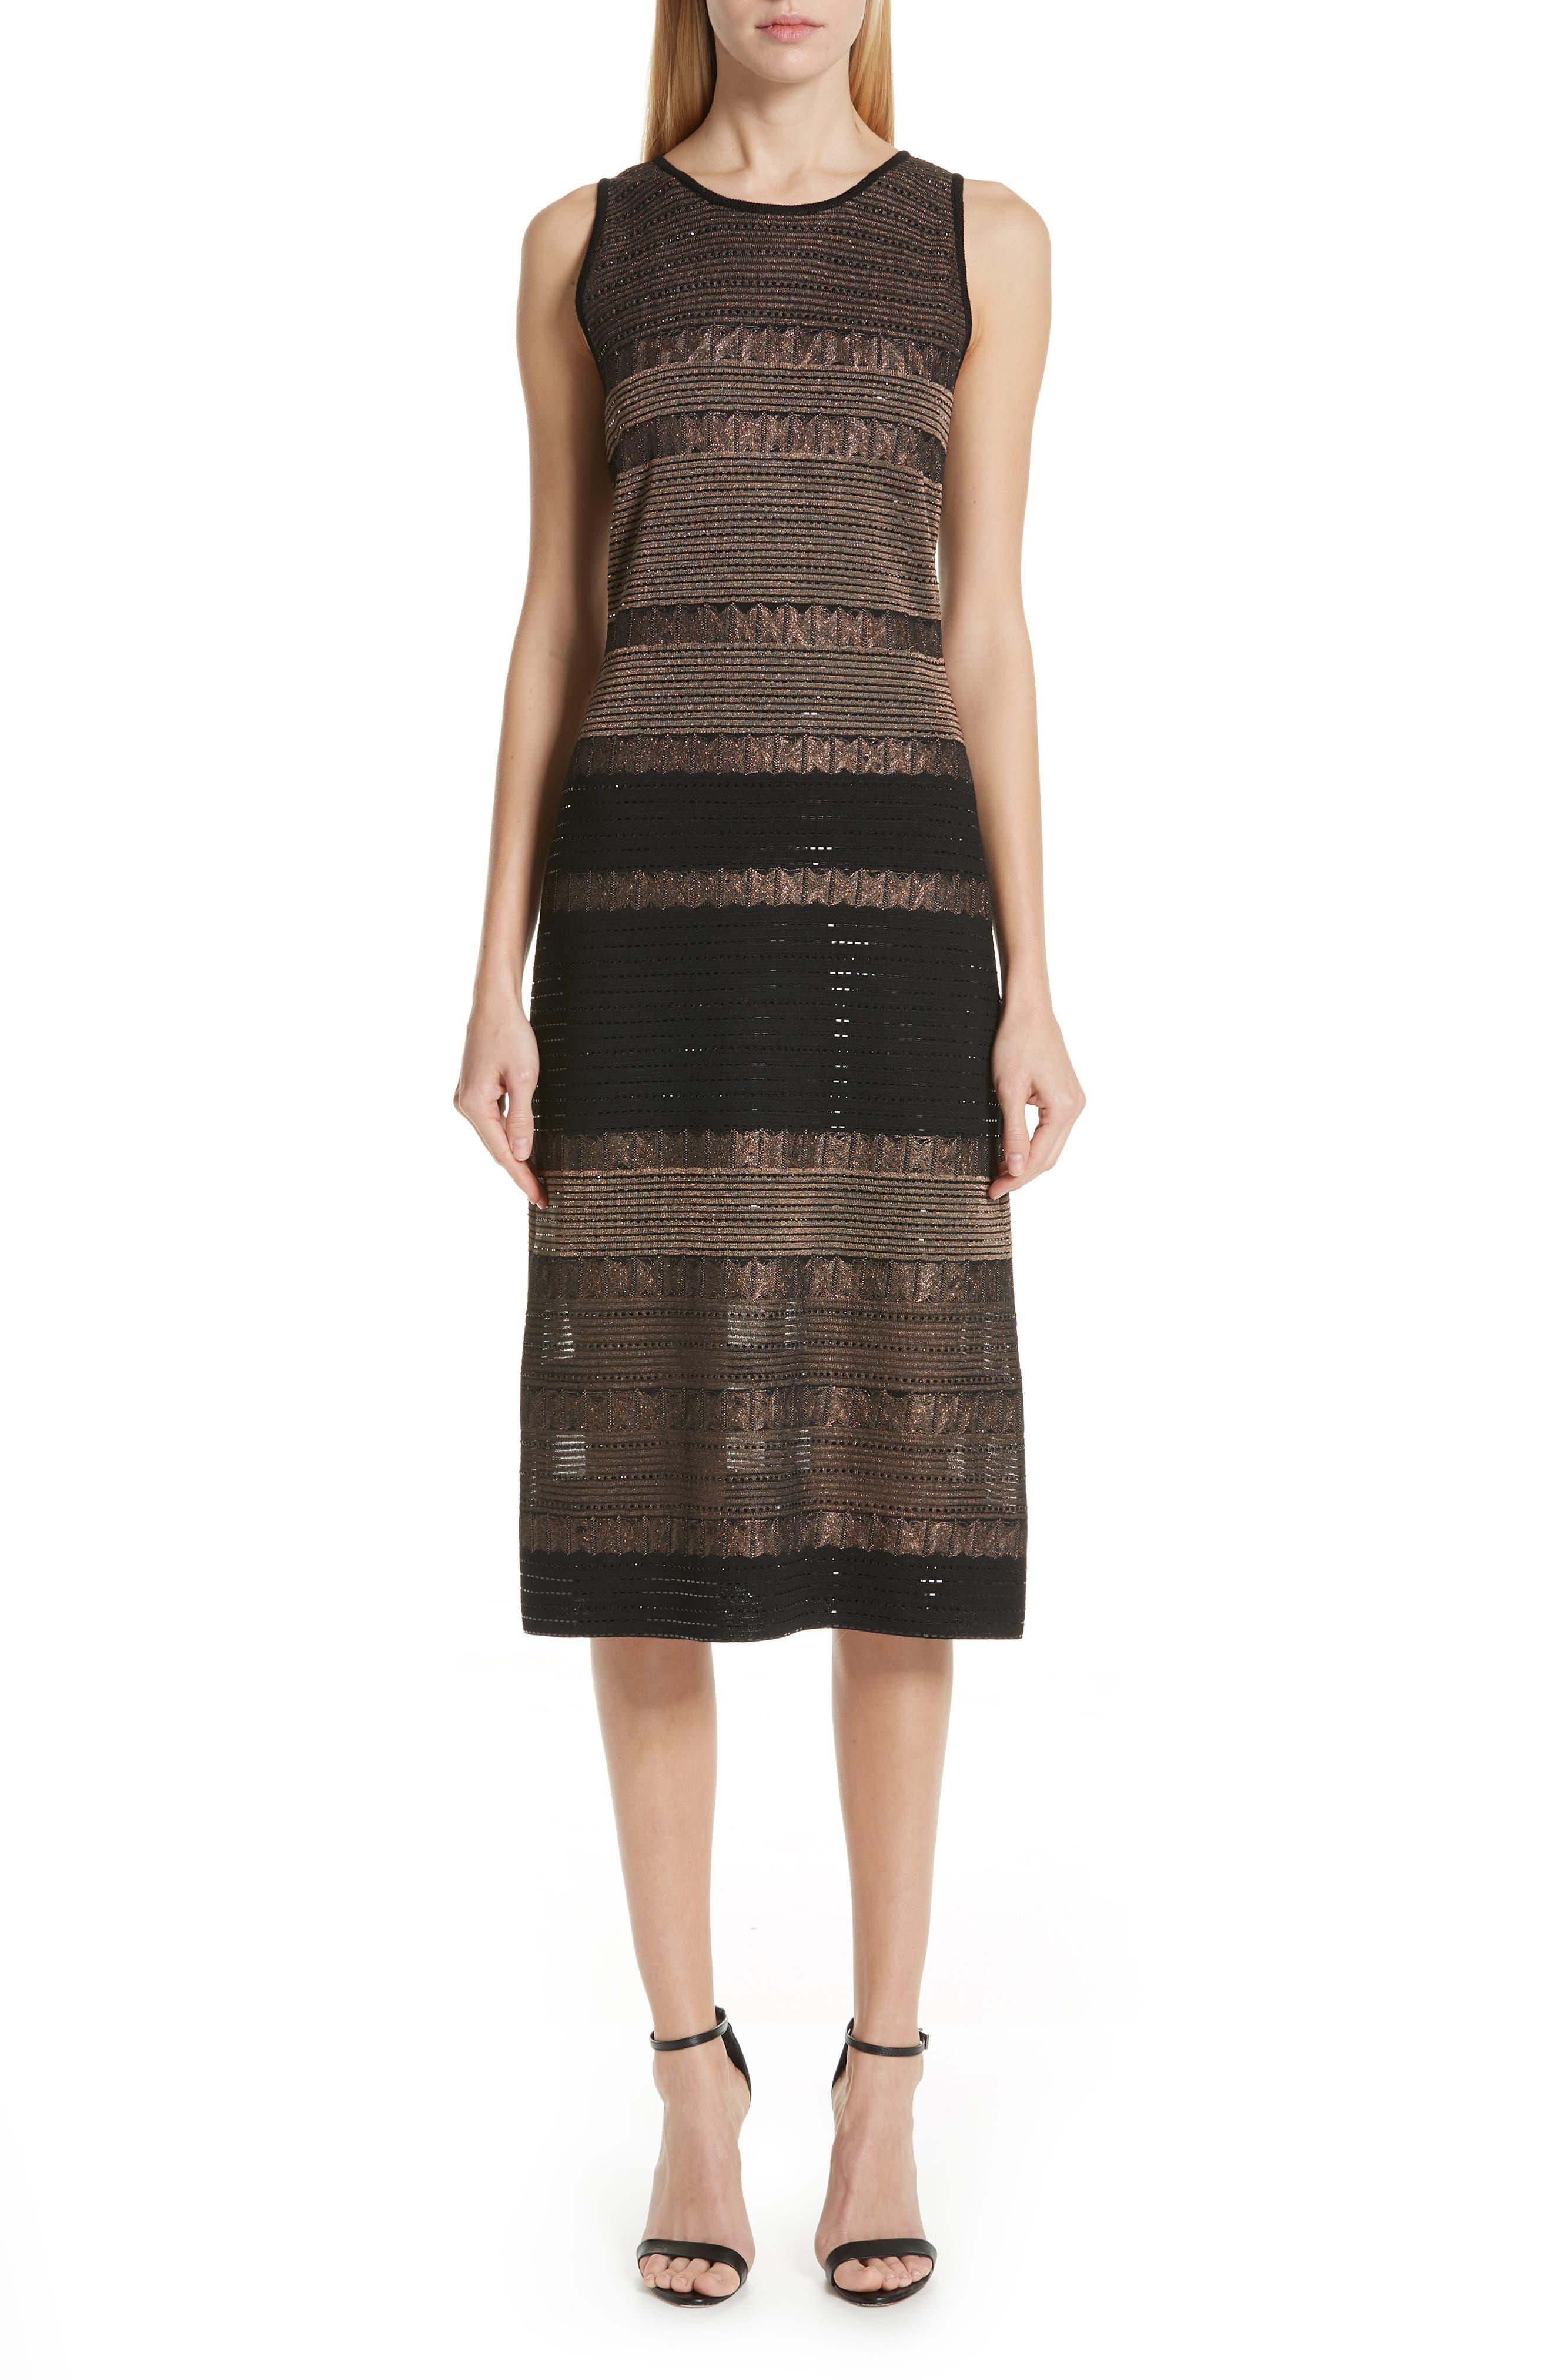 St. John Collection Aubrey Knit Dress, Black